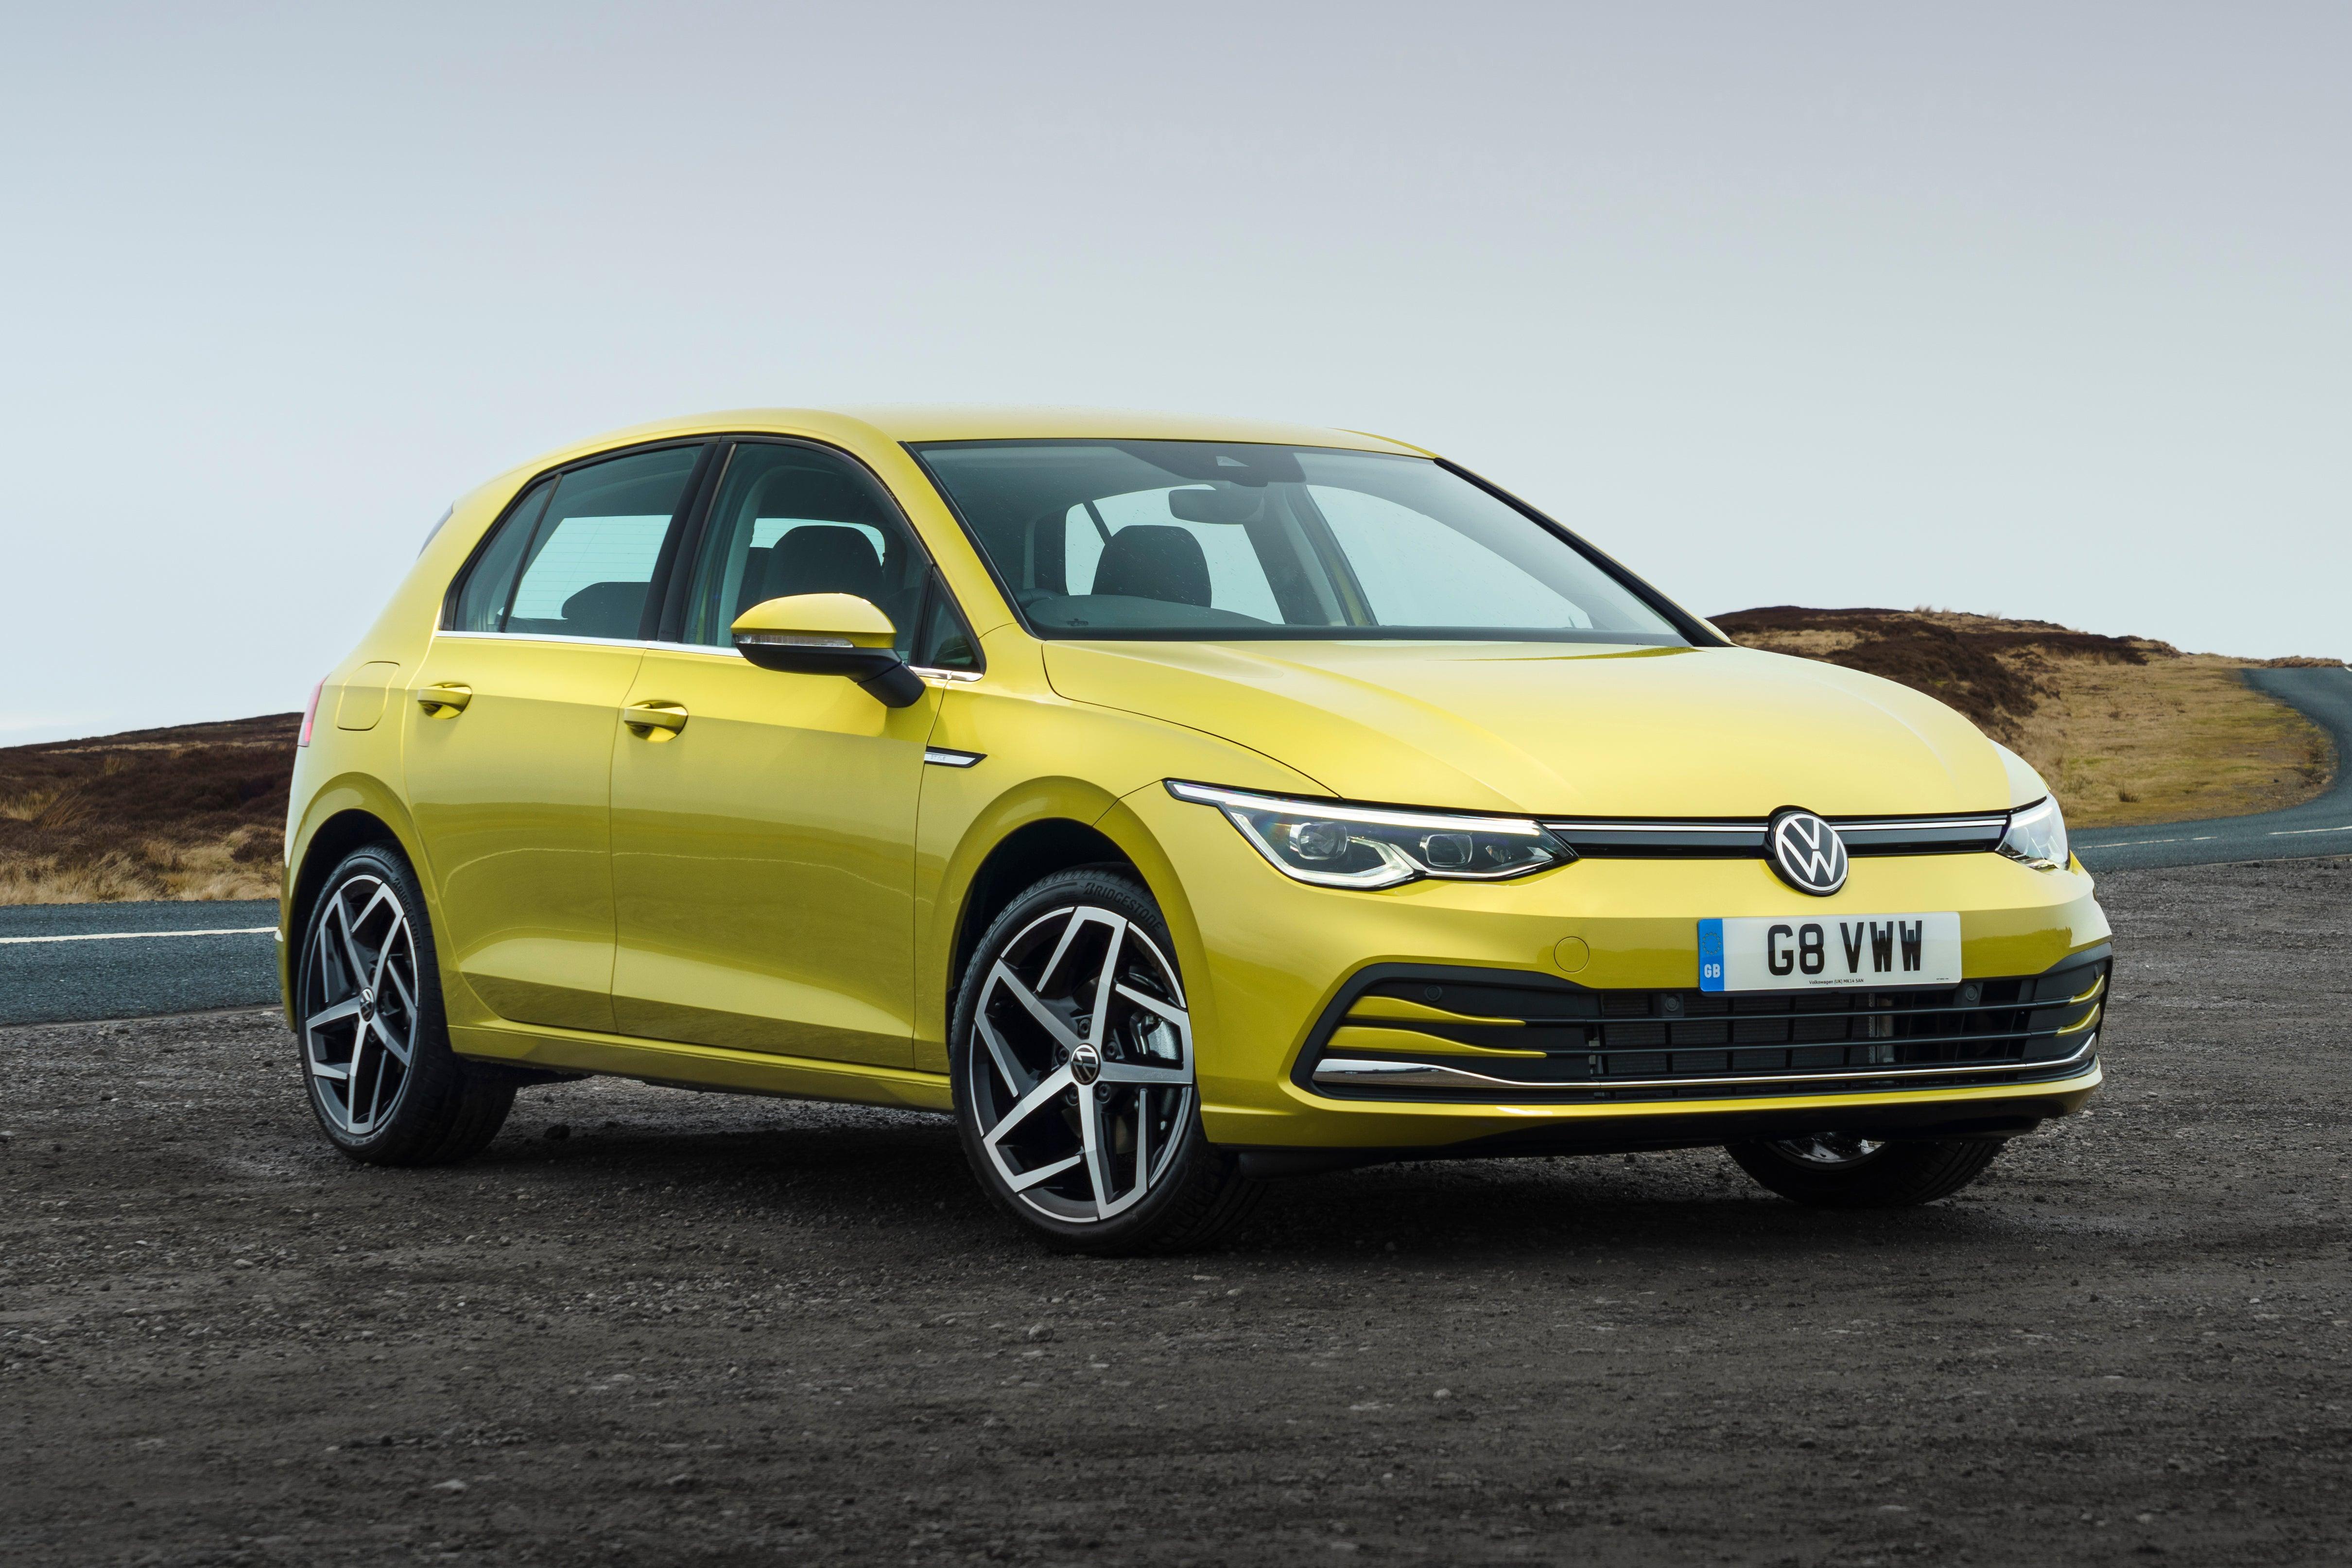 Volkswagen Golf Front Side View